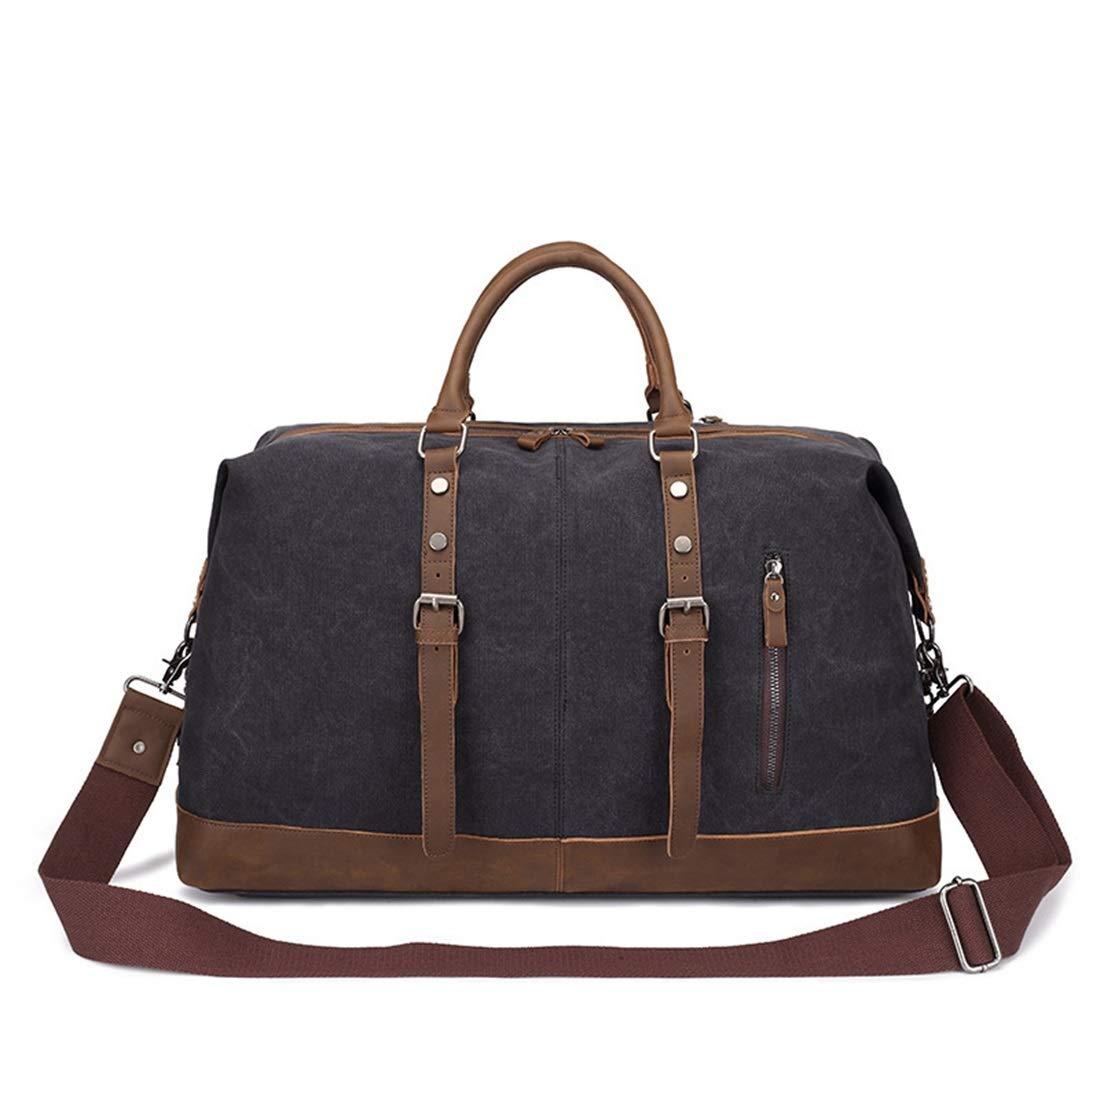 Color : Black MATCHANT Casual Zipper Waterproof Mens Luggage Bag Canvas Messenger Bag Shoulder Bag